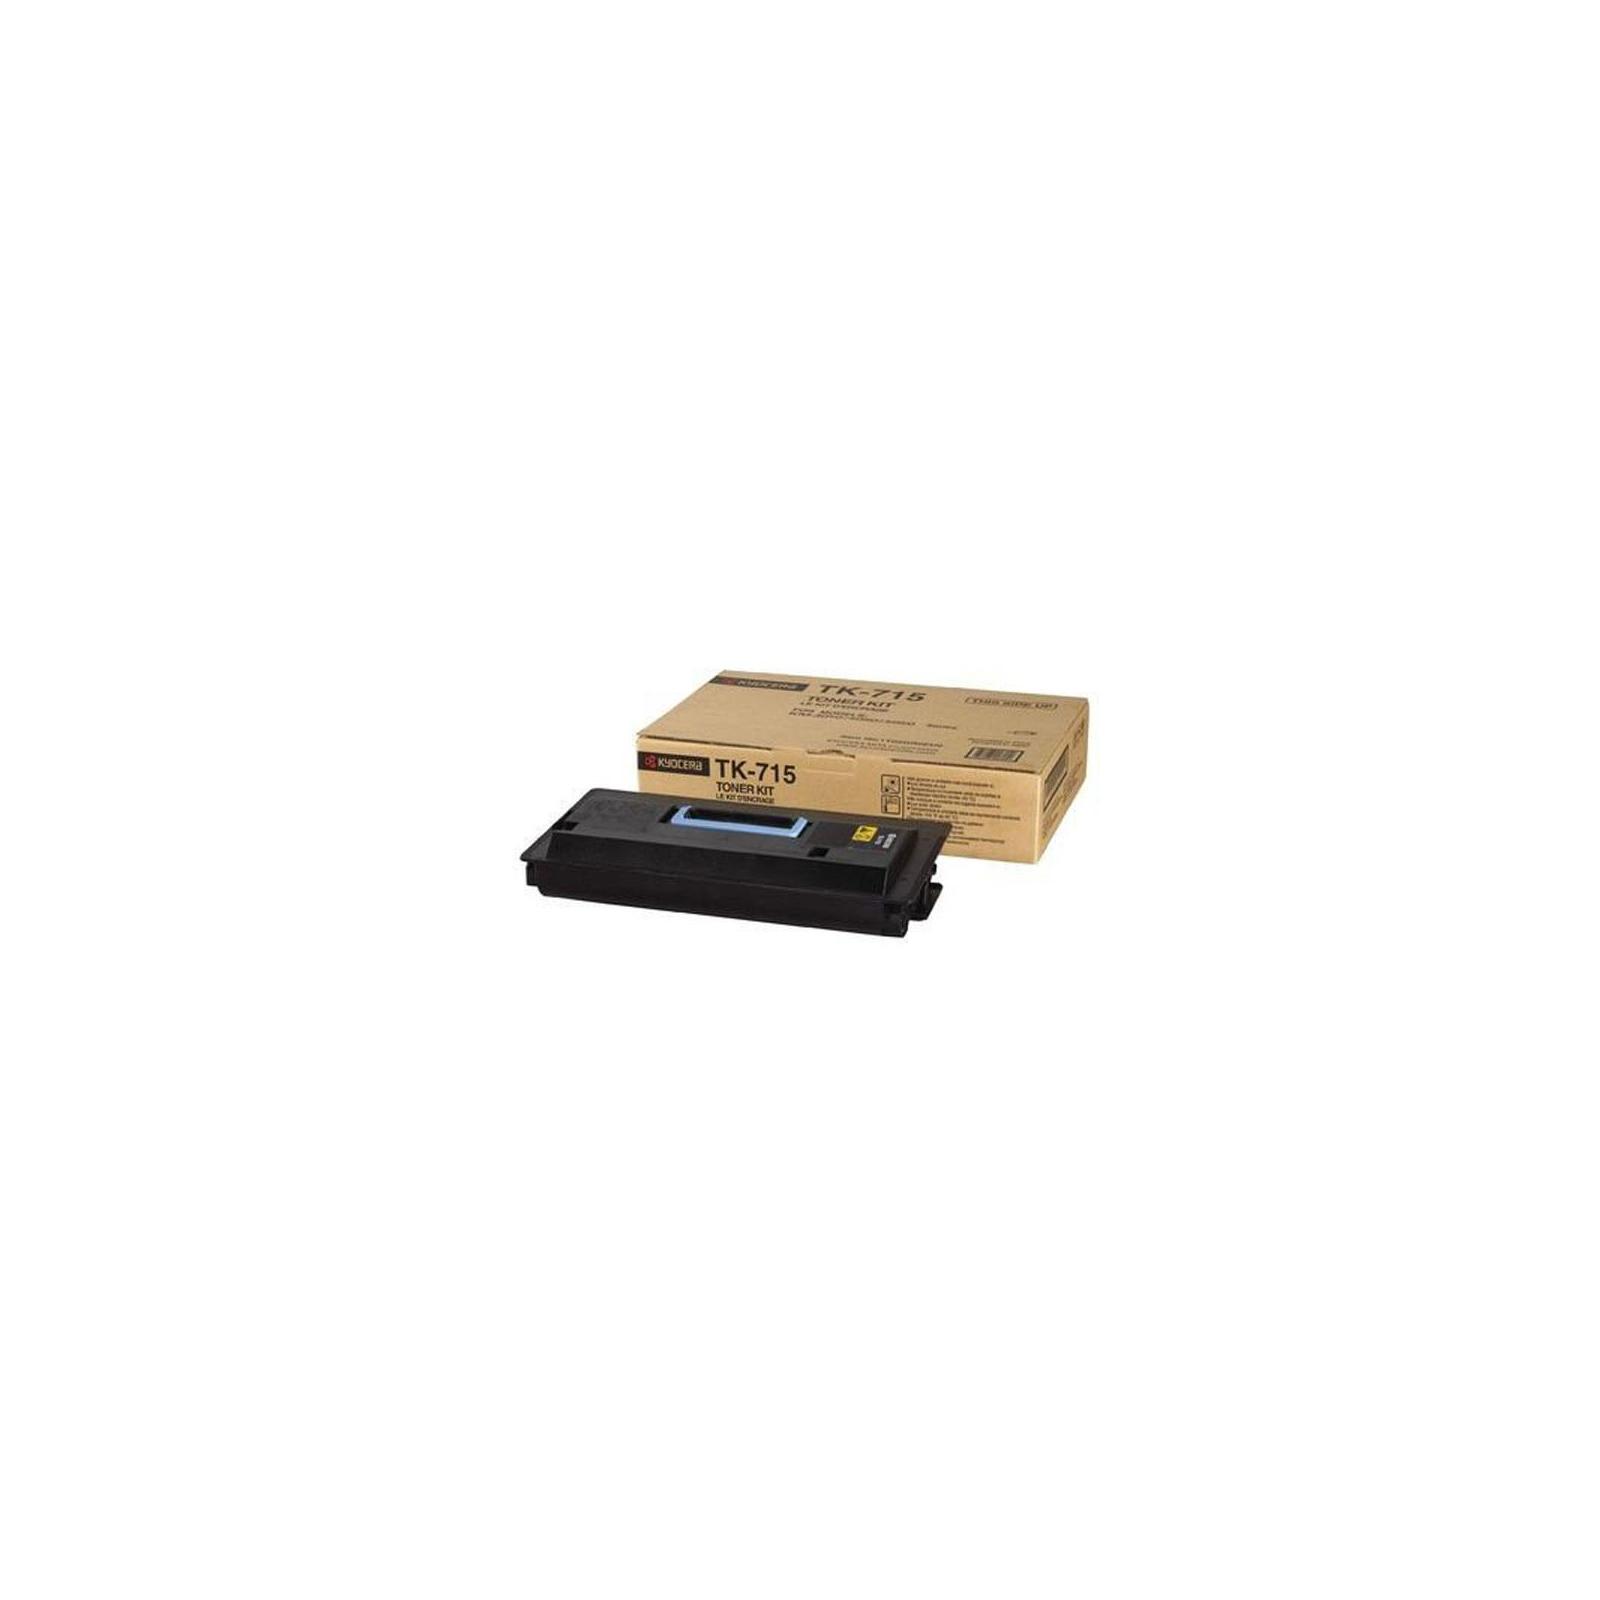 Тонер-картридж Kyocera TK-715 34K (1T02GR0EU0) изображение 6